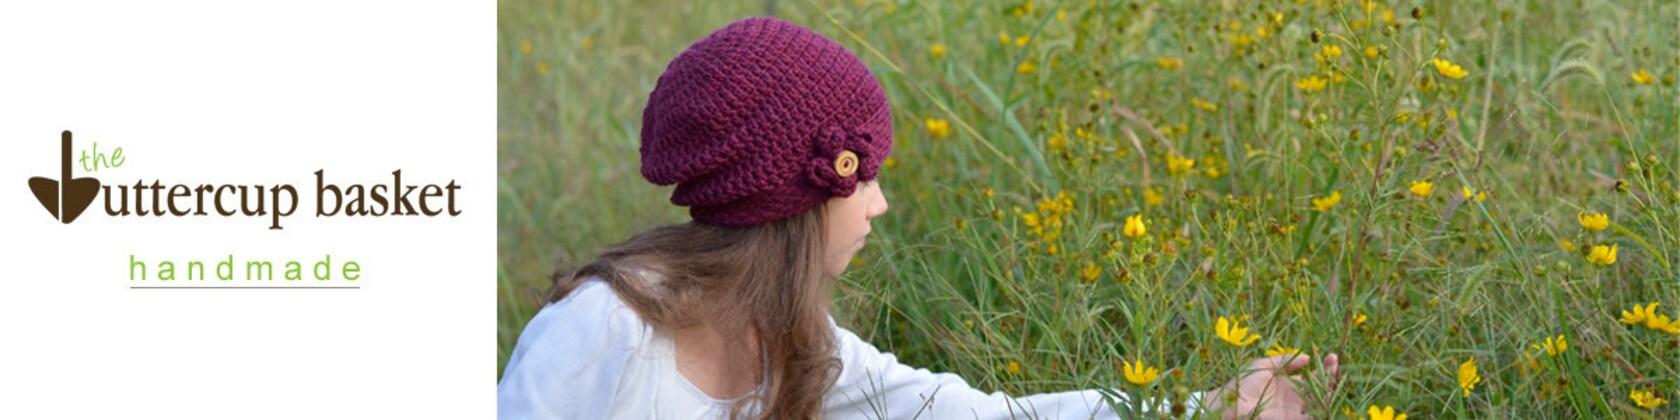 Crochet Hats & Crochet Patterns for Children por theButtercupBasket